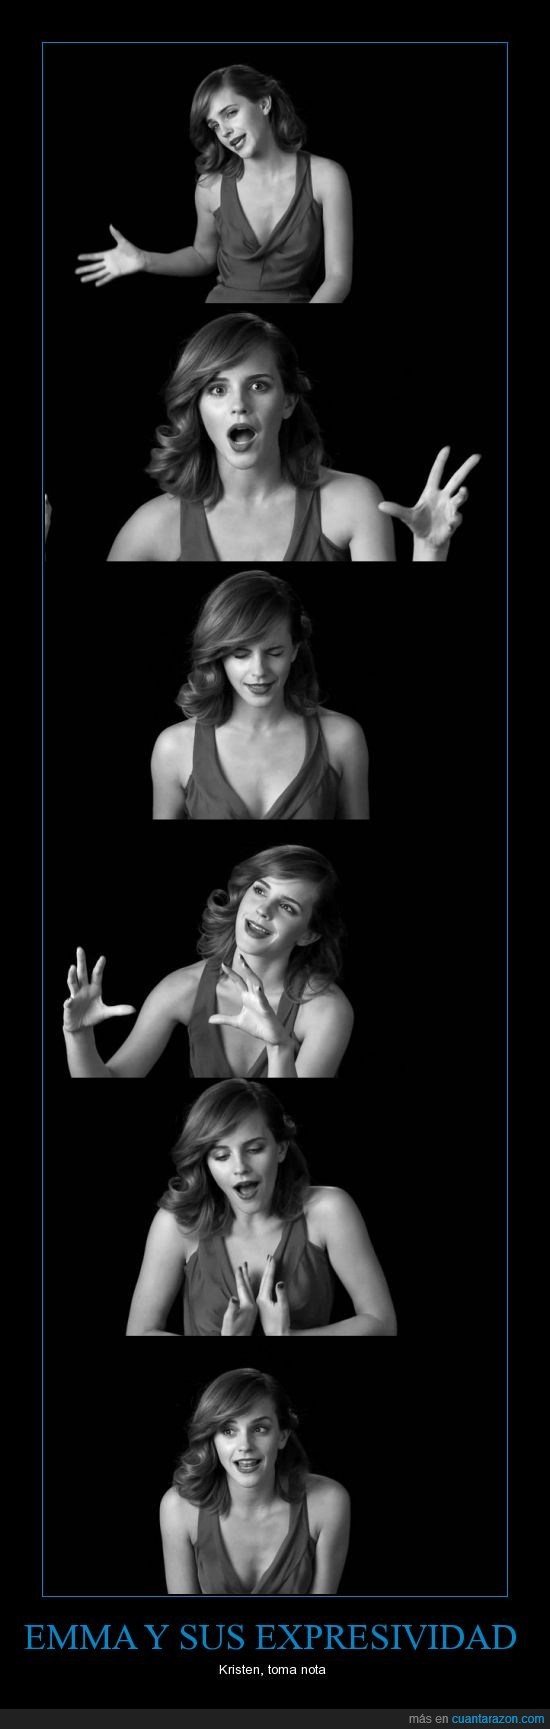 Crepúsuculo,Emma Watson,expresiones faciales,Harry Potter,Kristen Stewart,nota